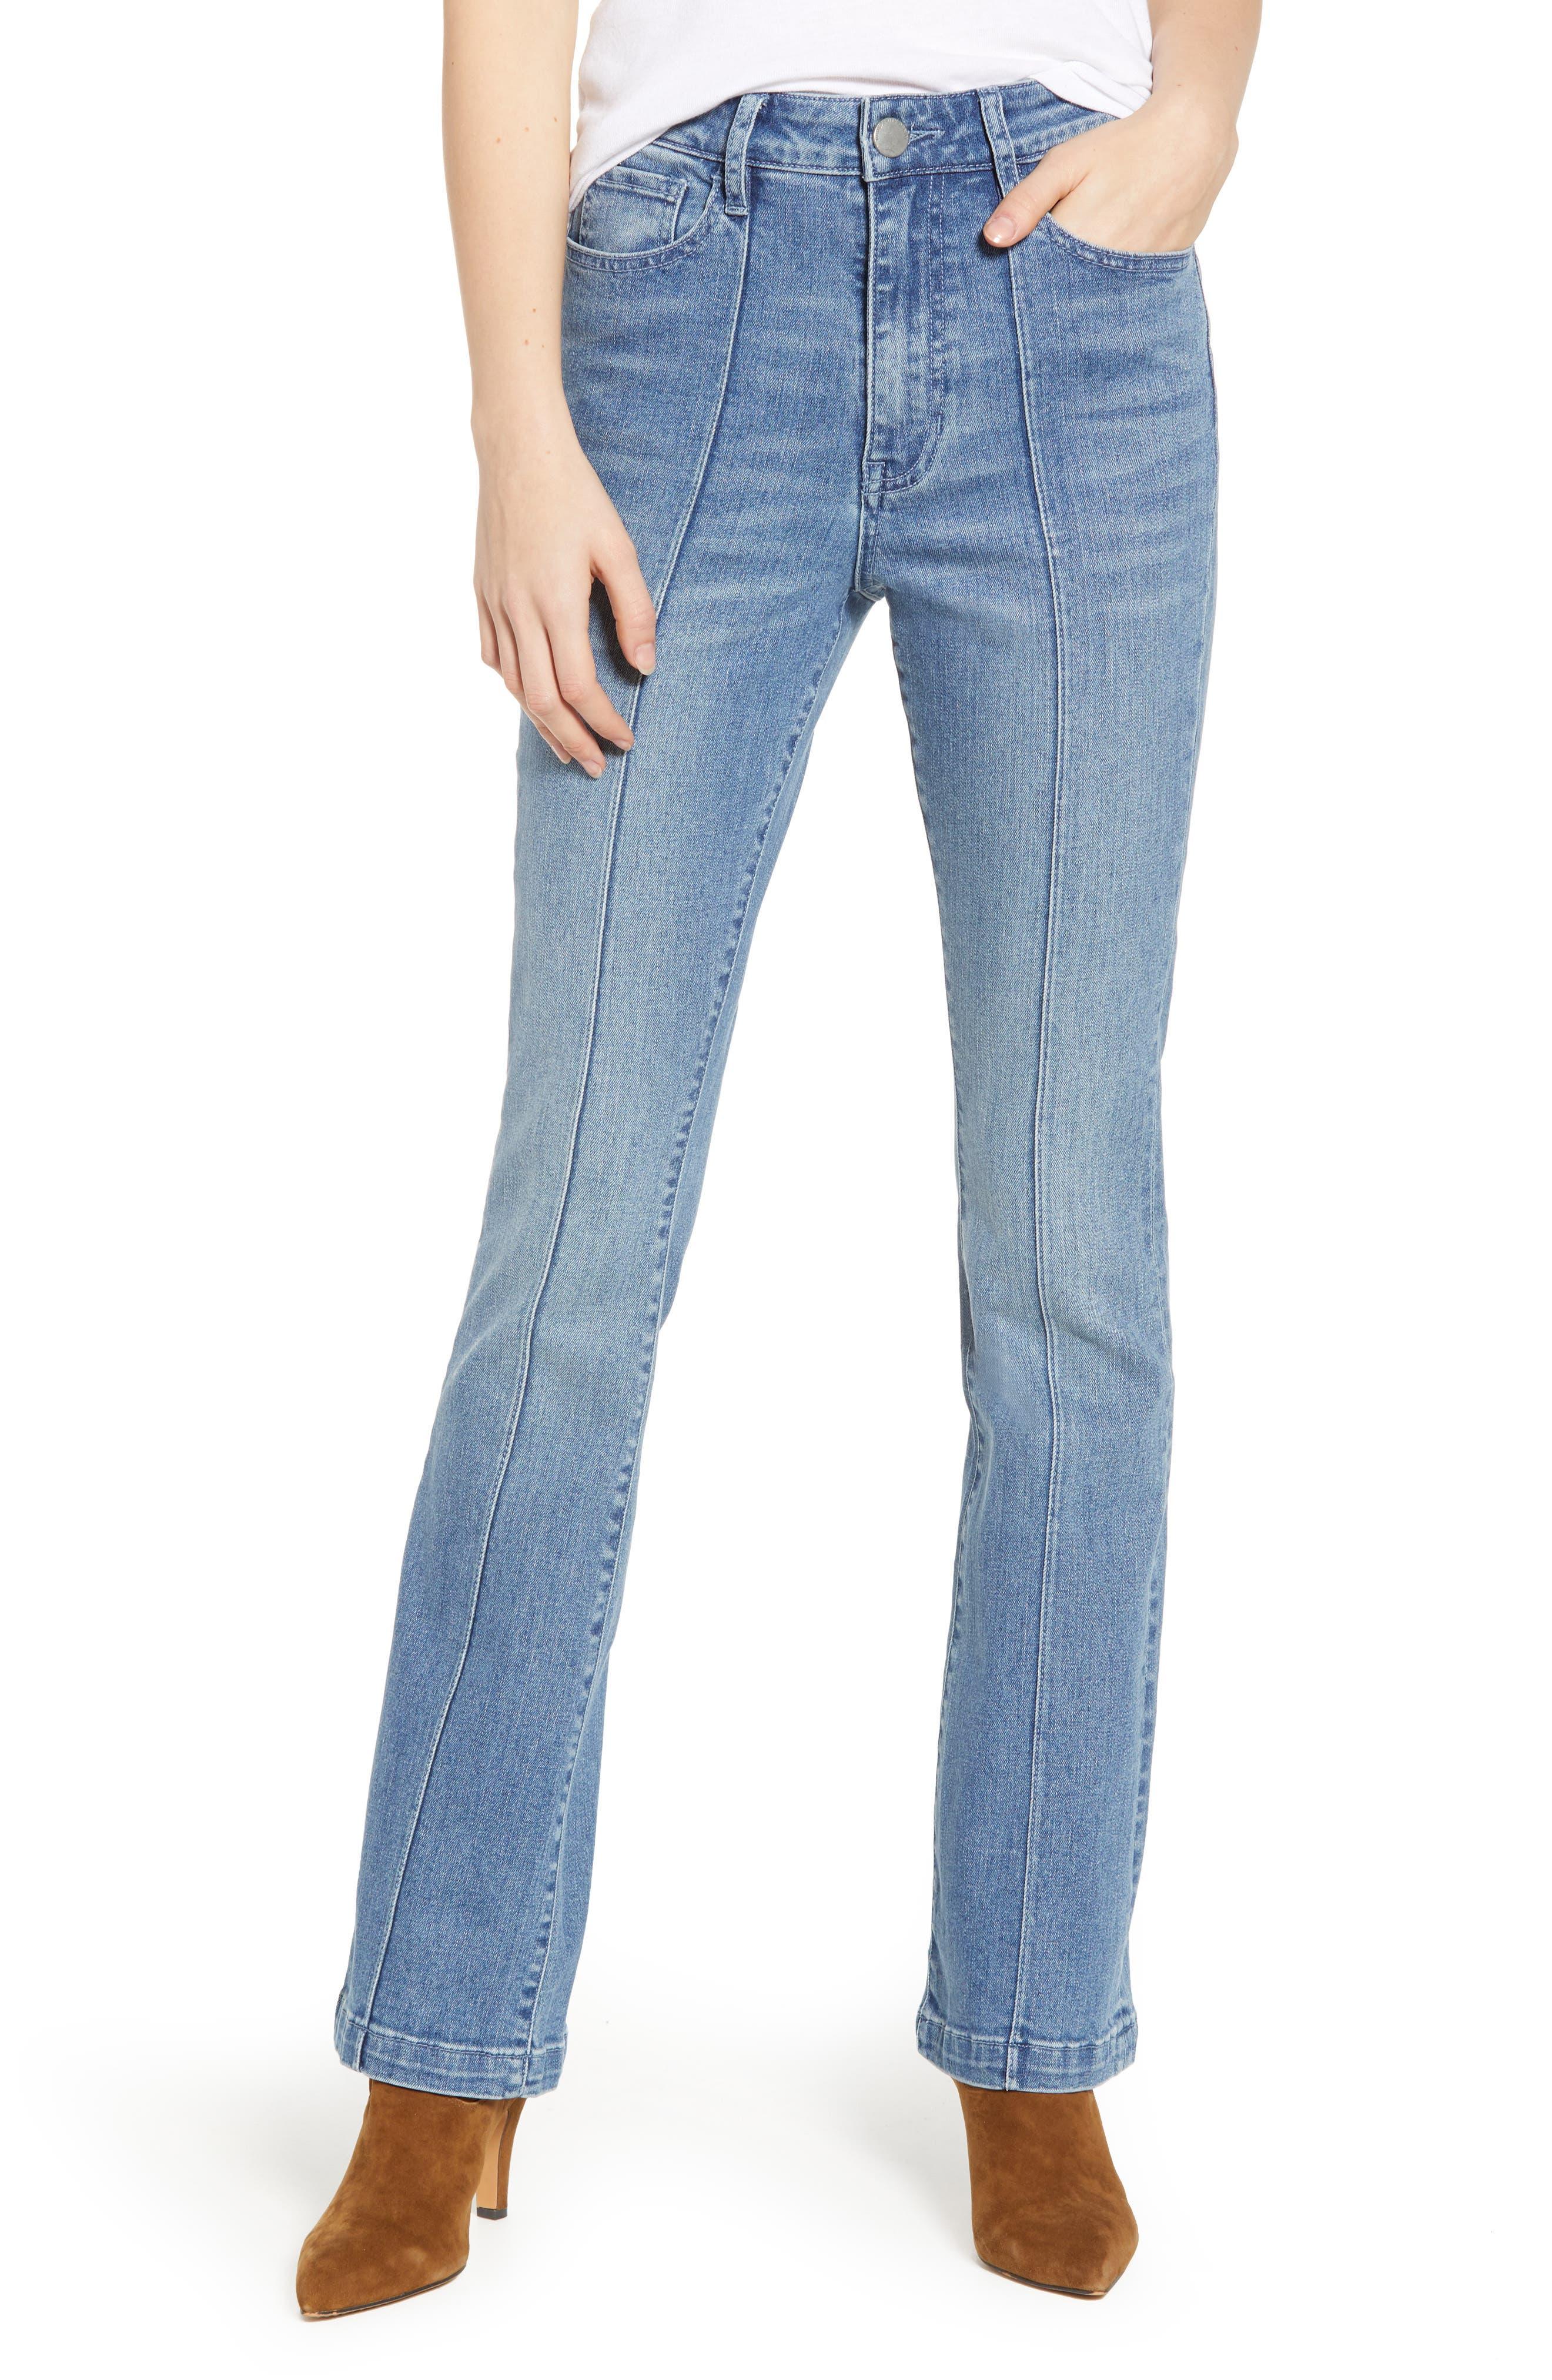 PROSPERITY DENIM, Pintuck Flare Jeans, Main thumbnail 1, color, KARLA WASH